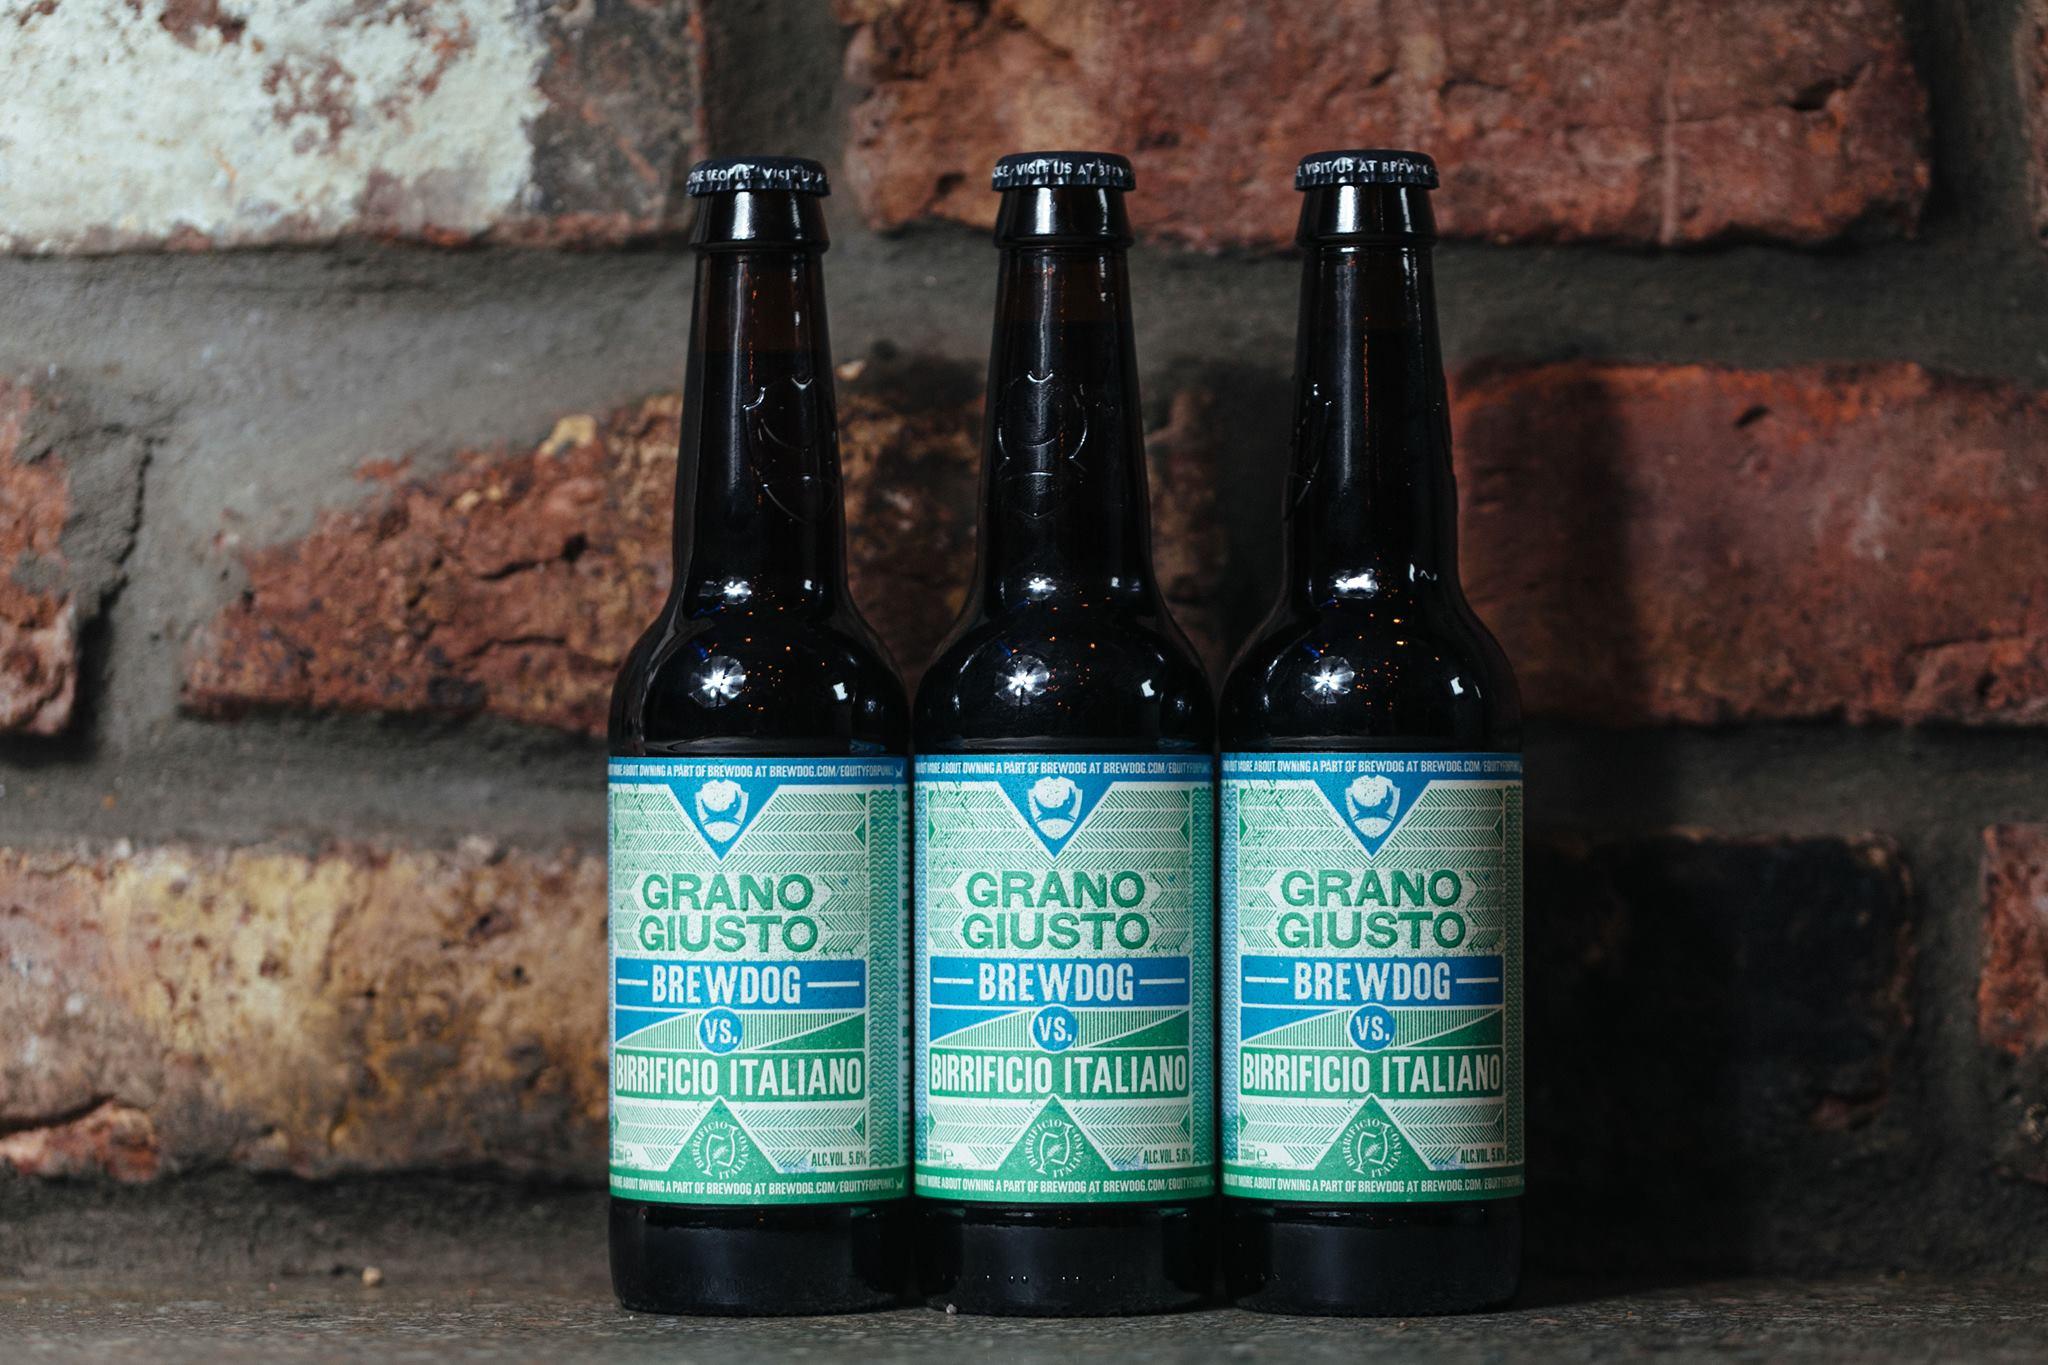 Birra artigianale granogiusto. Birrificio Italiano e Brewdog